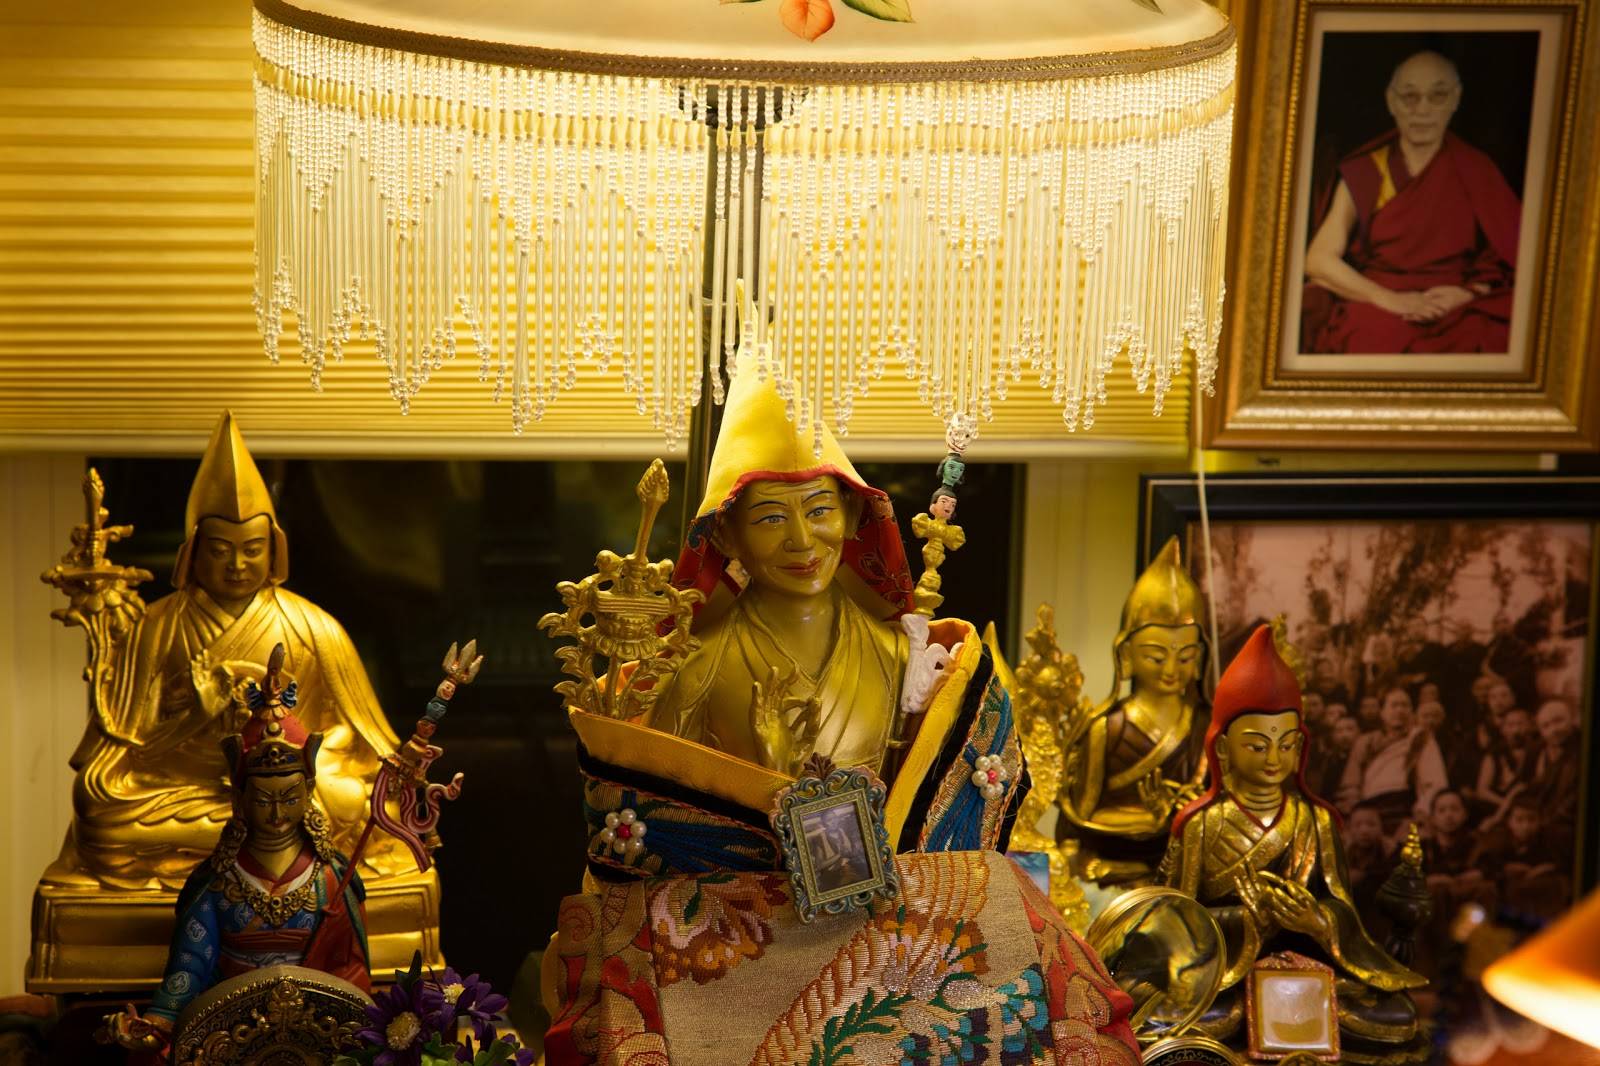 Statues in the Prajnaparamita room. Photo by Ven. Thubten Kunsang.